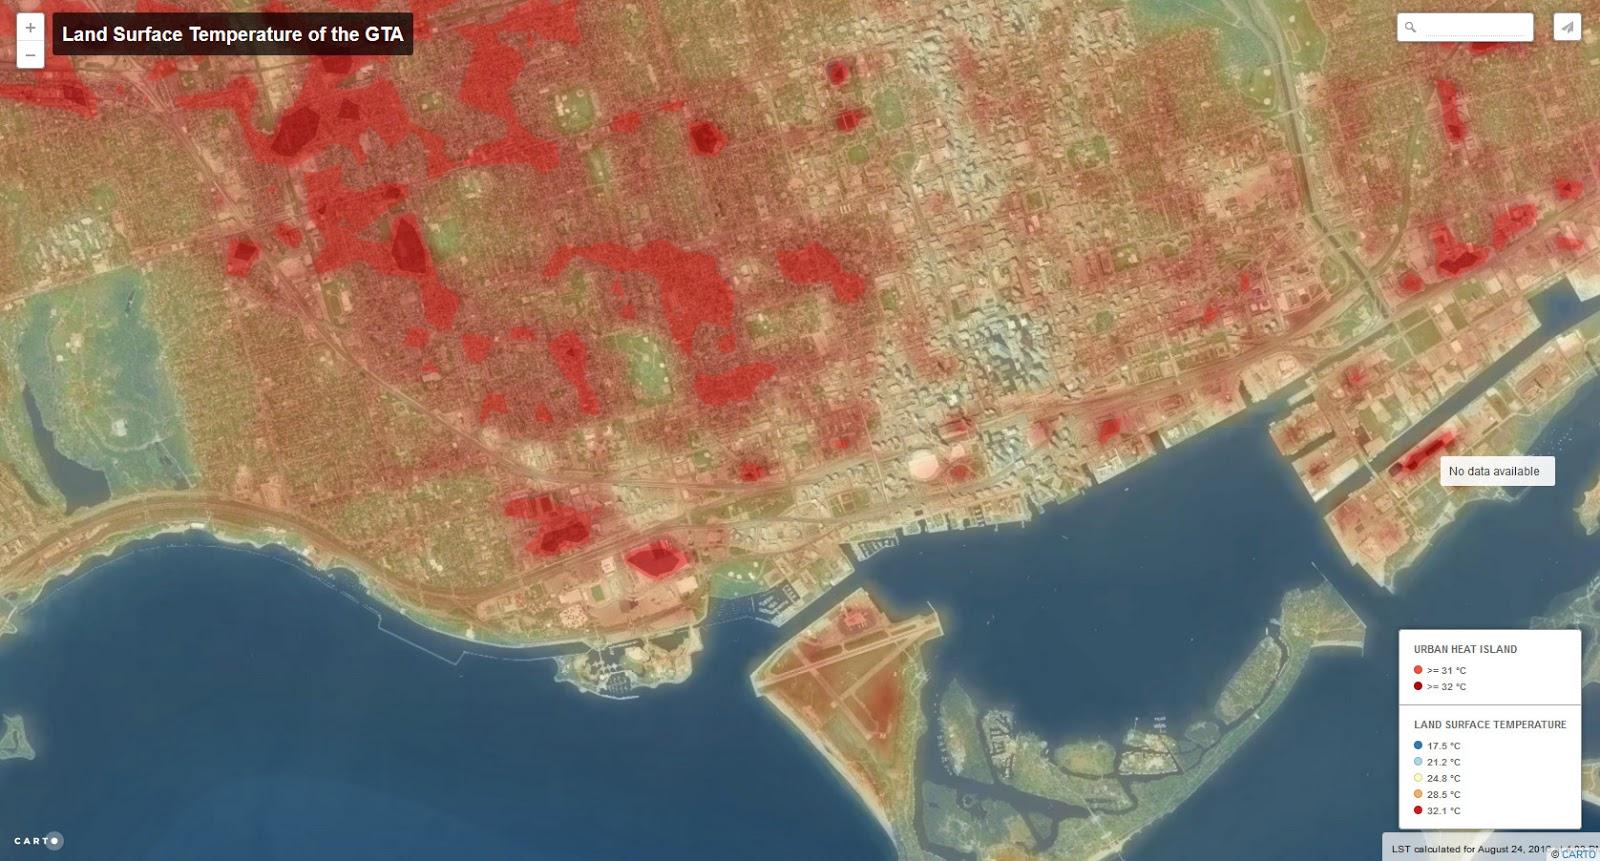 Land Surface Temperature of Toronto